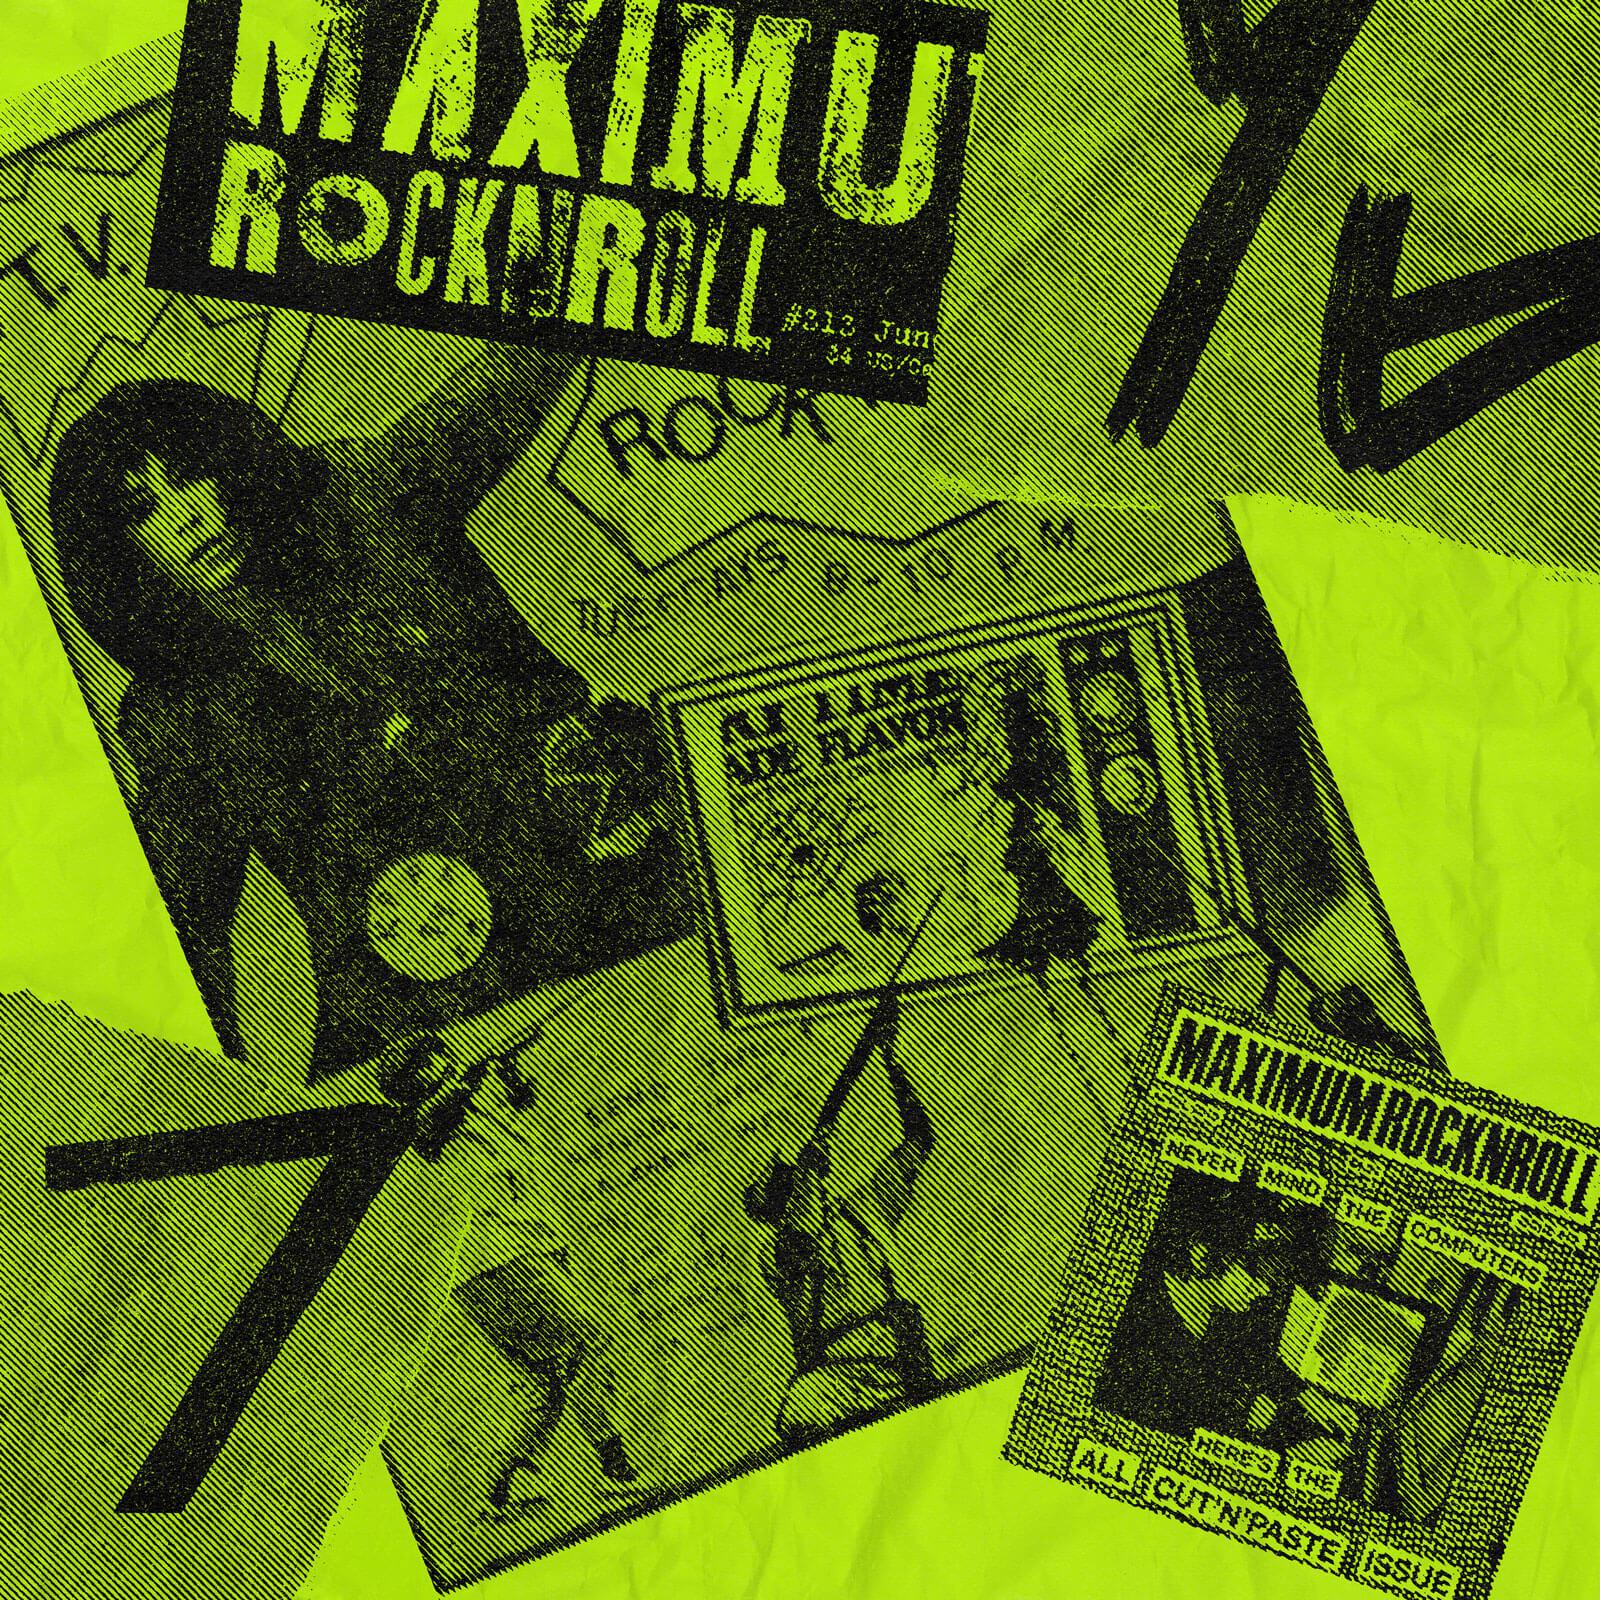 Punk publishing collage artwork.